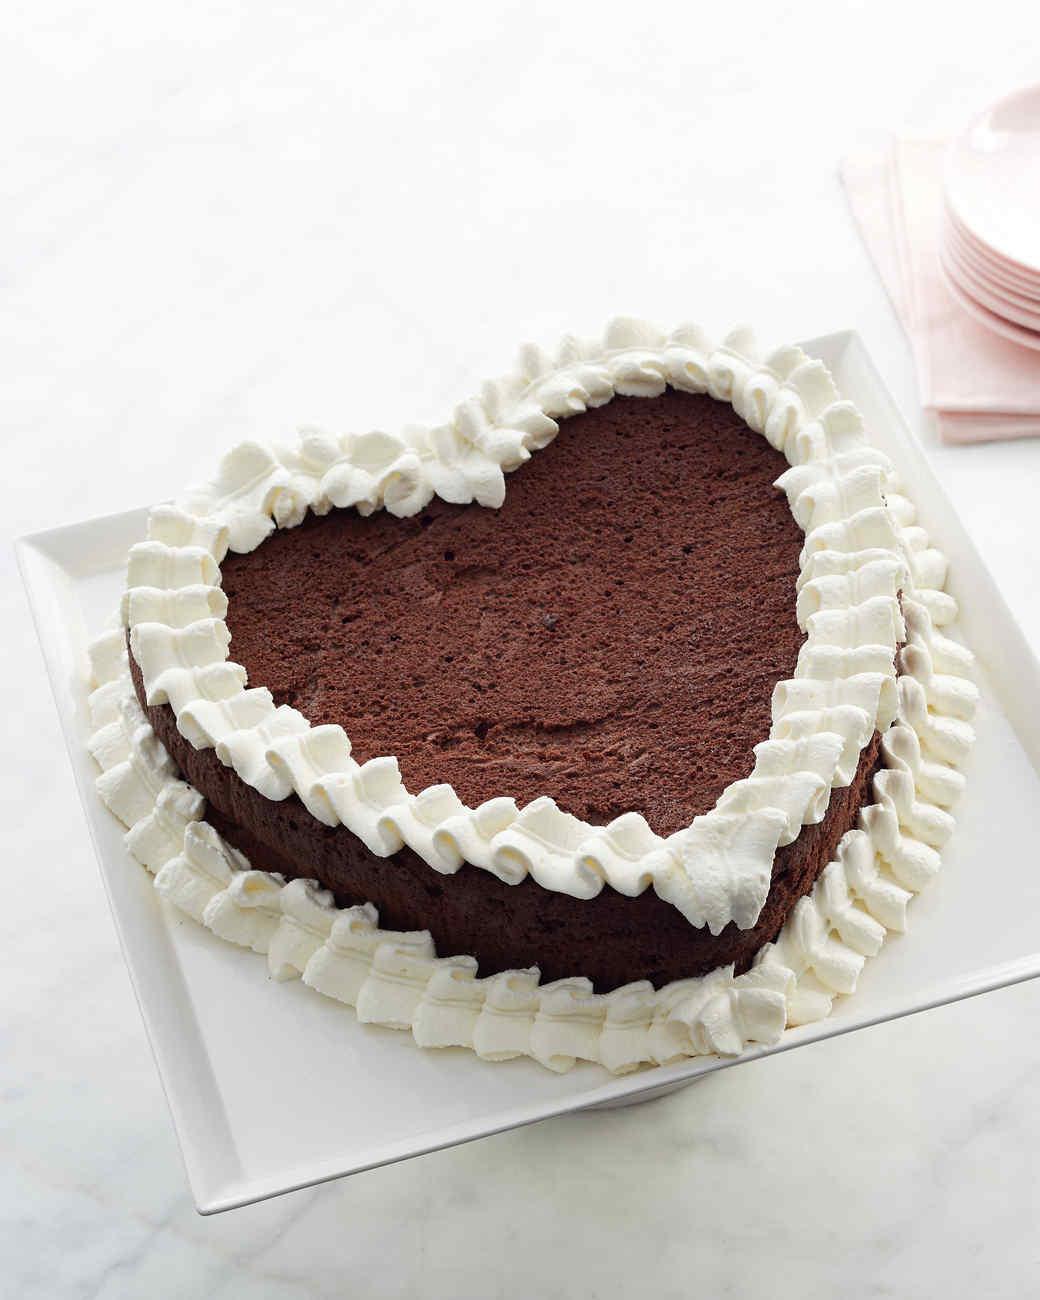 roberta-heart-chocolate-cake-161-d112178.jpg